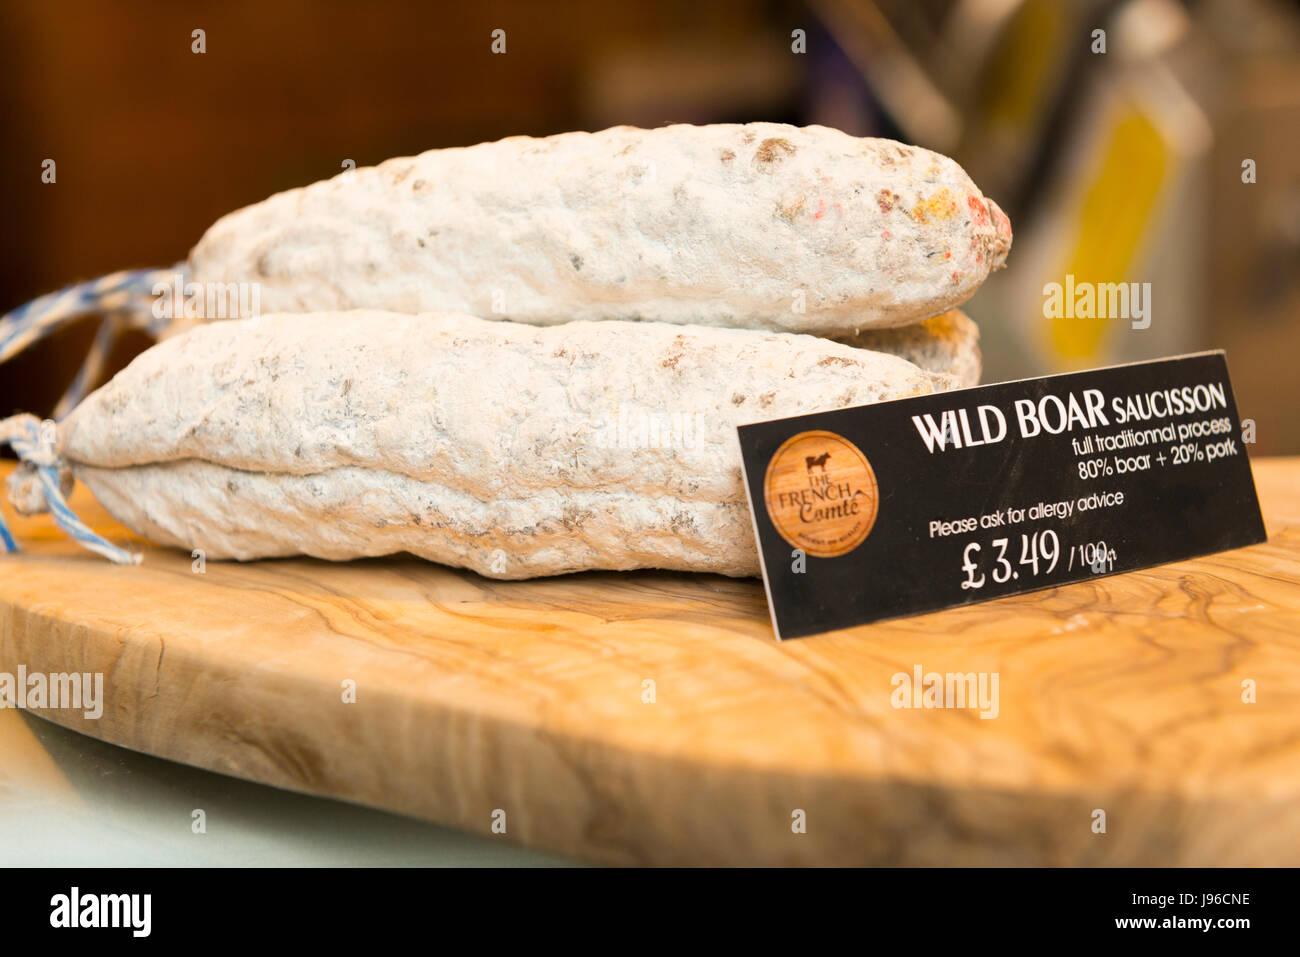 Borough Market London stylish upmarket food Wild Boar Saucisson Sausage charcuterie - Stock Image